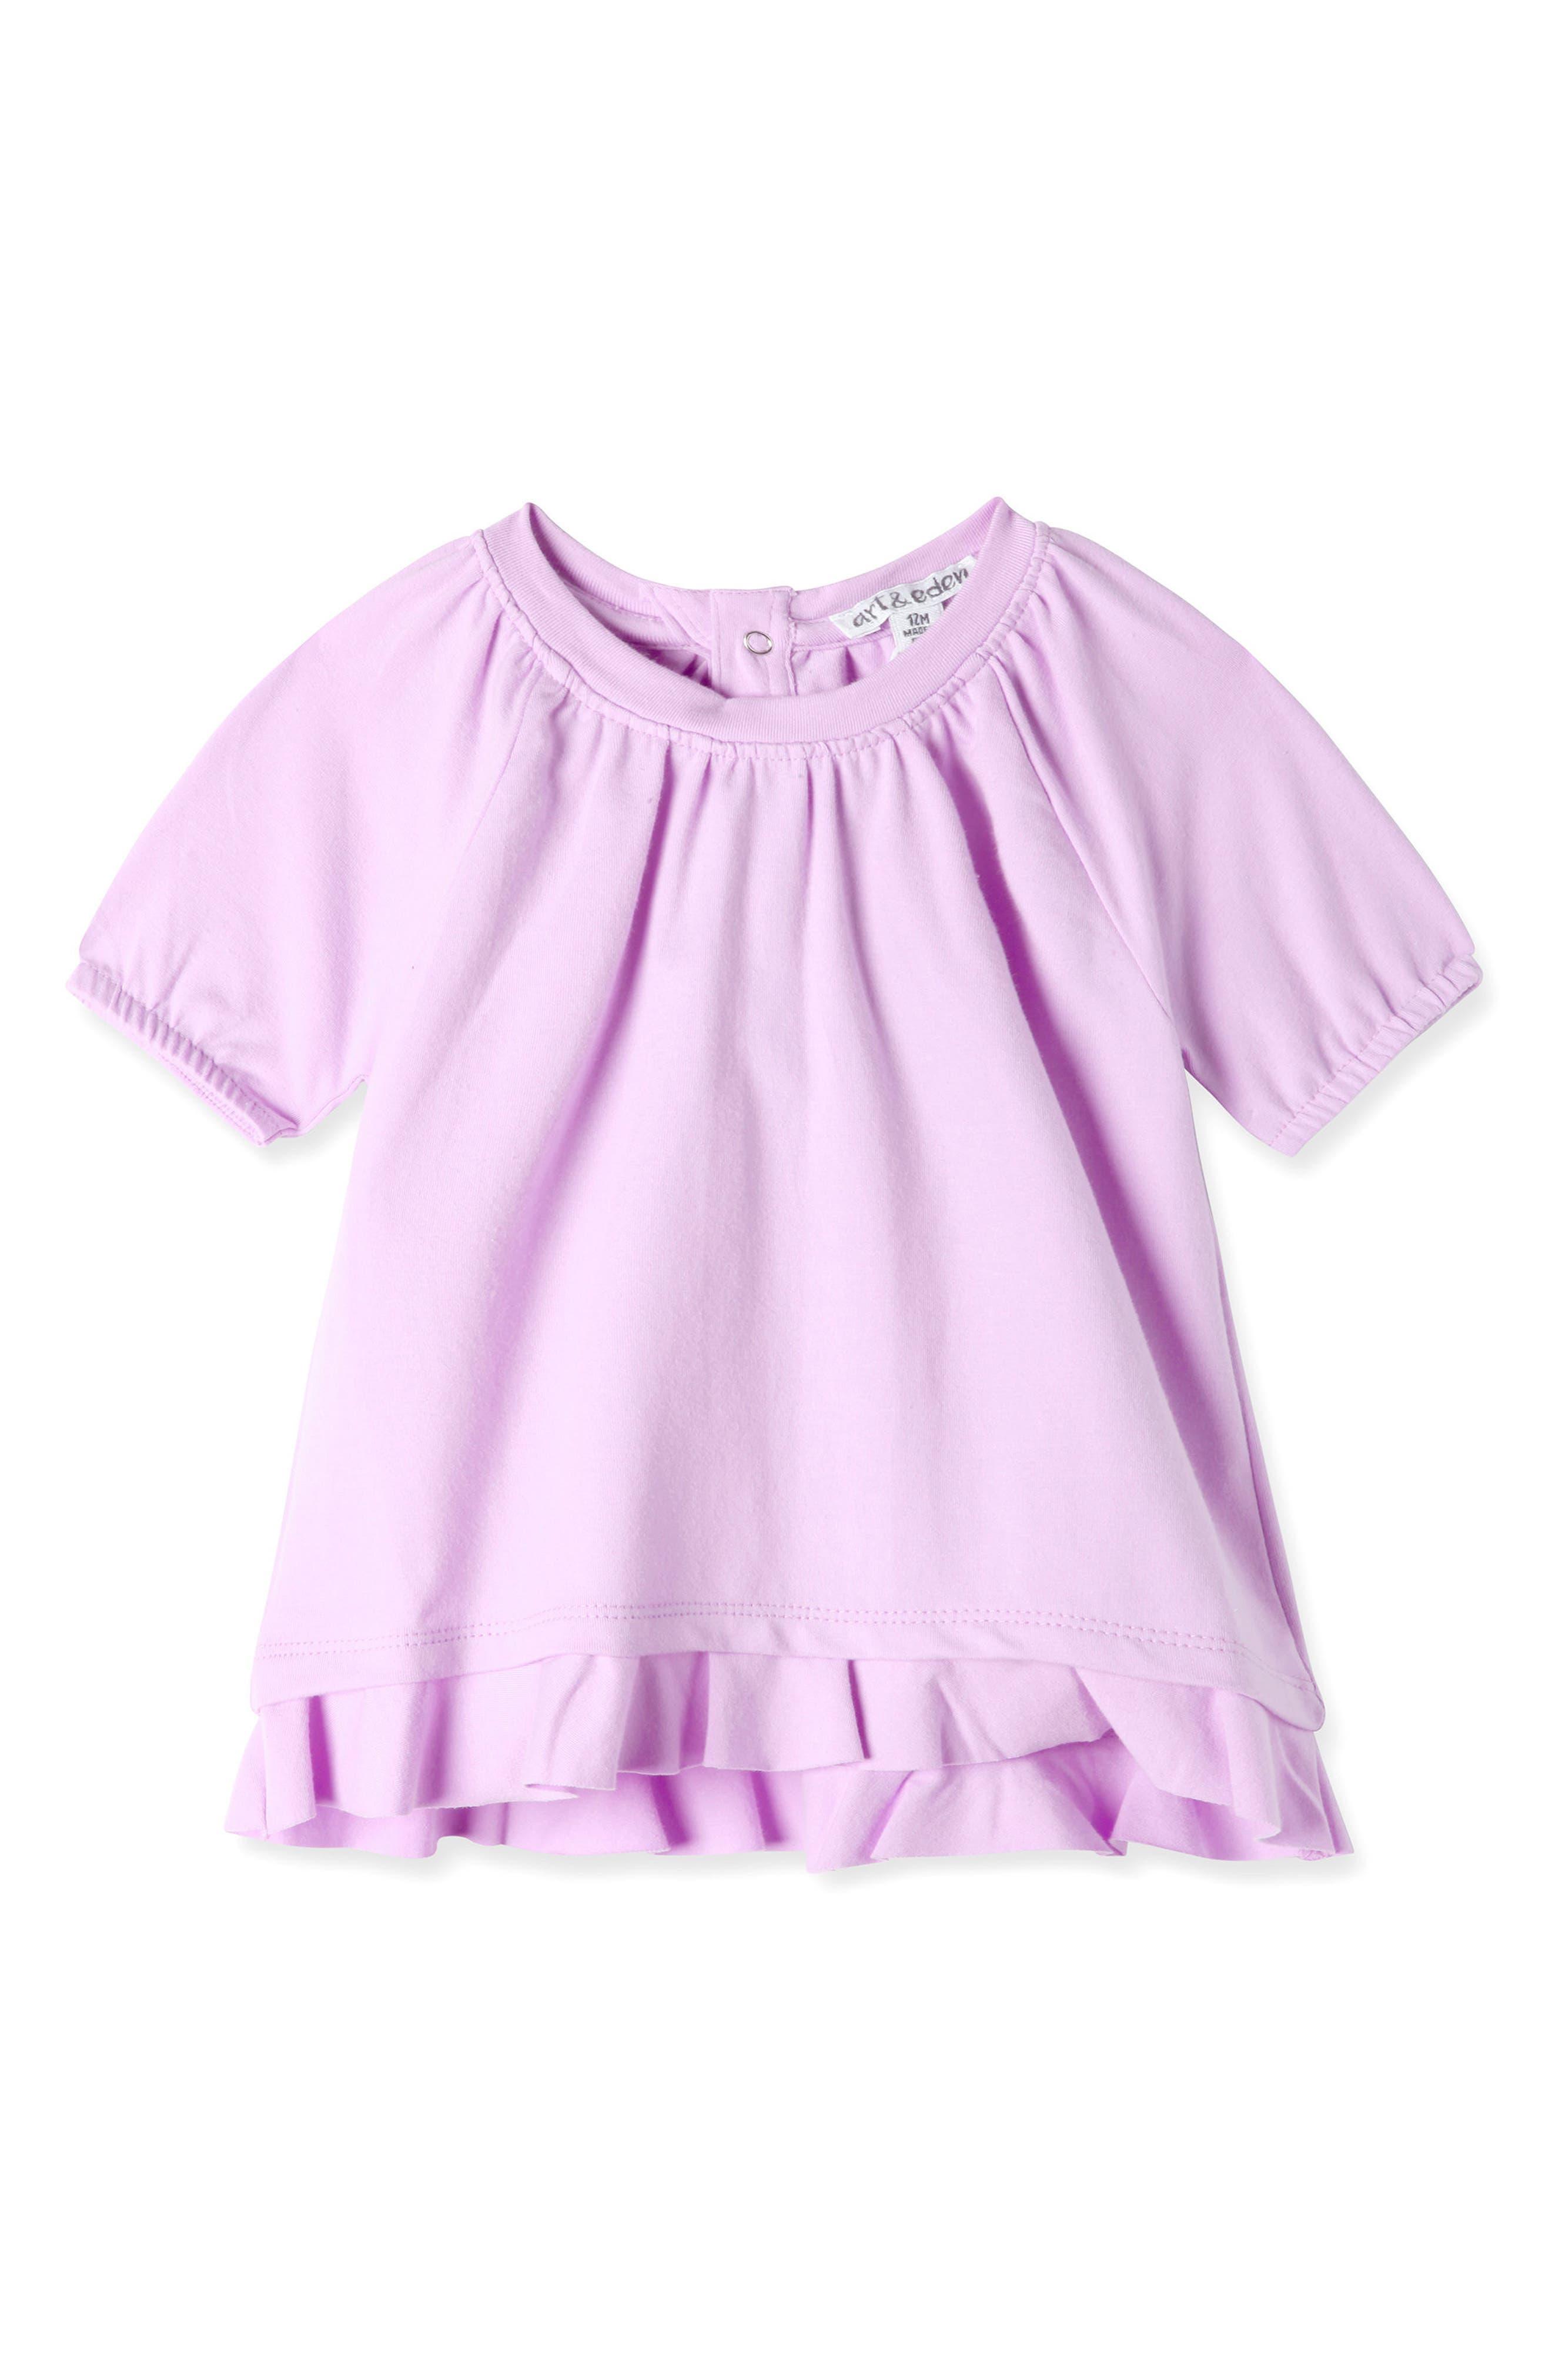 Art & Eden Ellie Top (Toddler Girls & Little Girls)